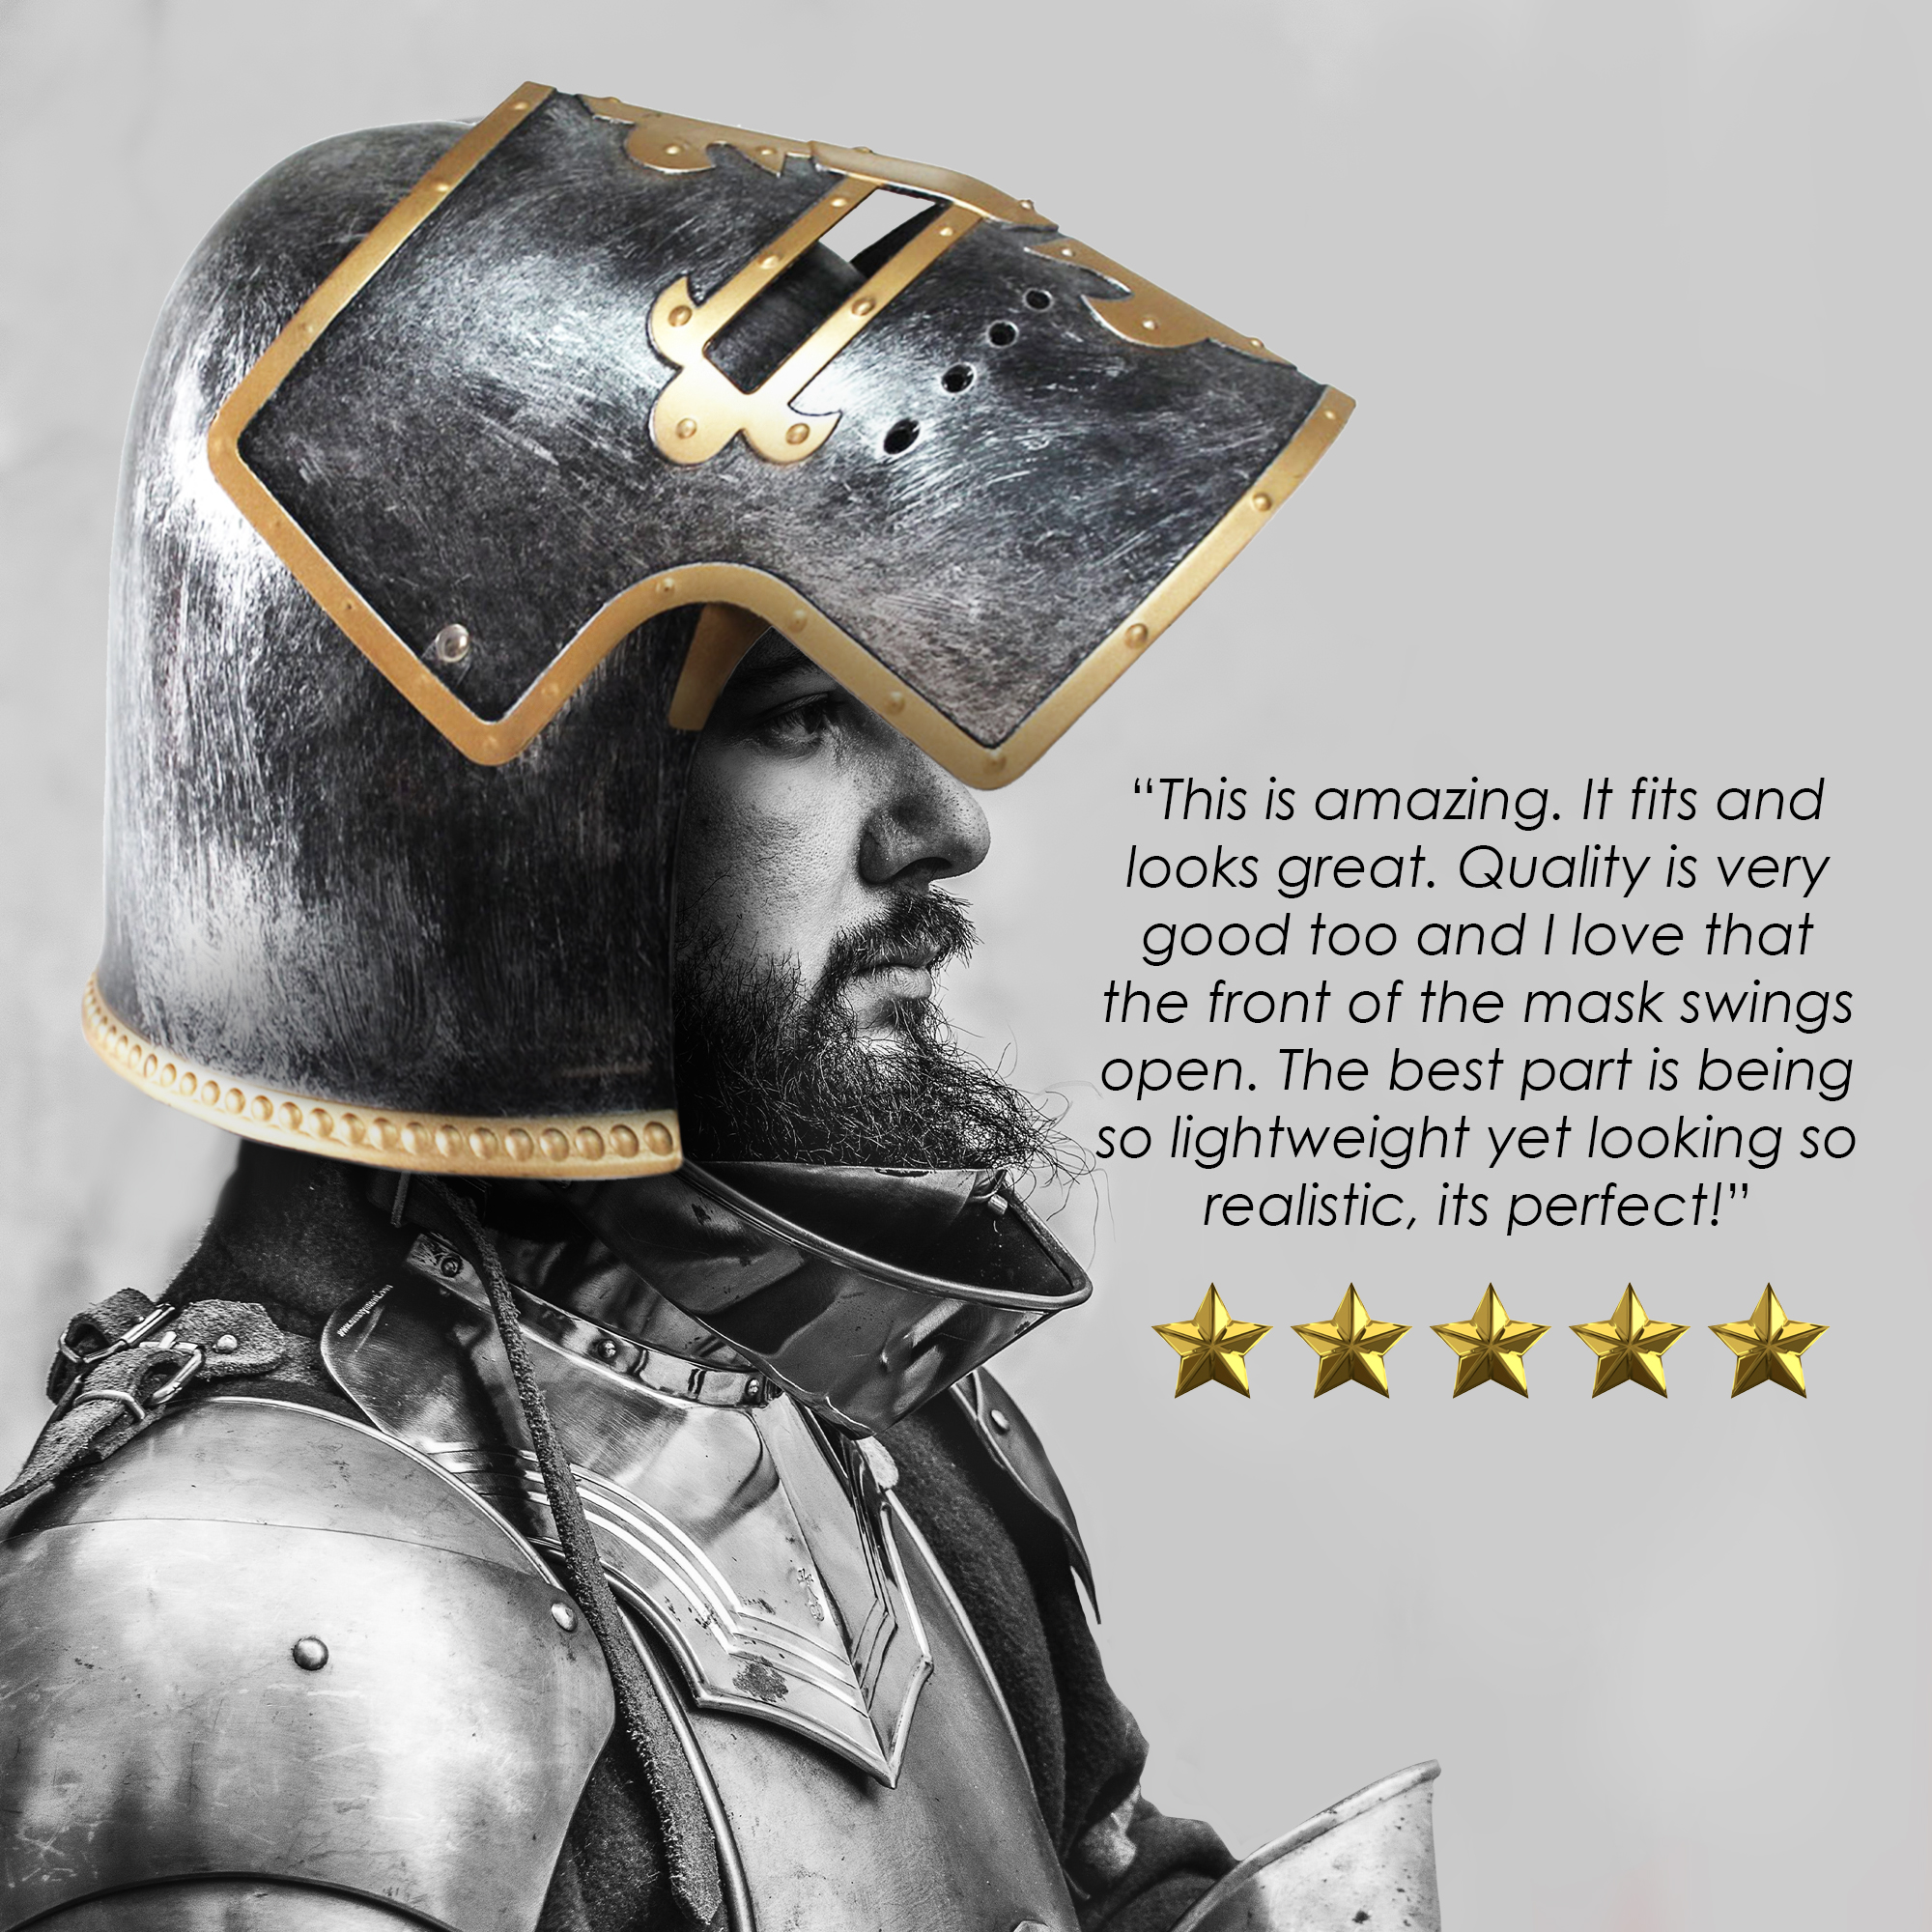 thumbnail 11 - Silver Pewter Knight Roman Armor Crusader Helmet Mask Medieval Adult Costume